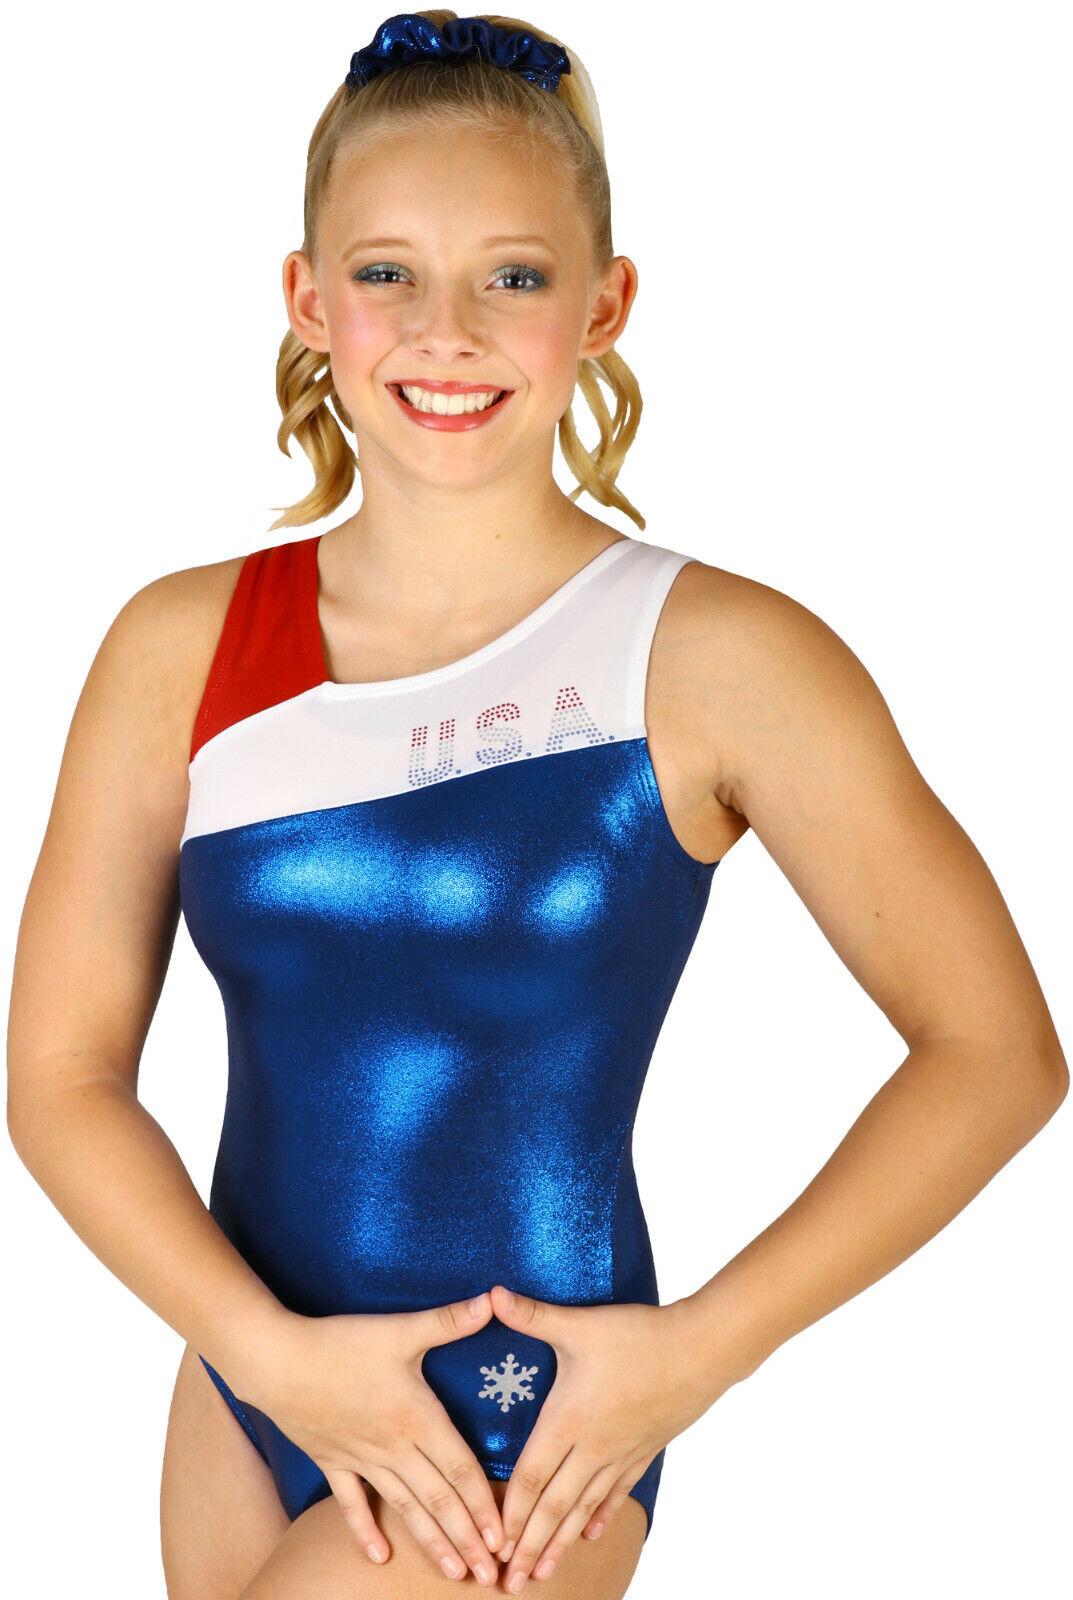 NEW  Bravo Bravo Bravo USA Gymnastics Leotard by Snowflake Designs 1efa77